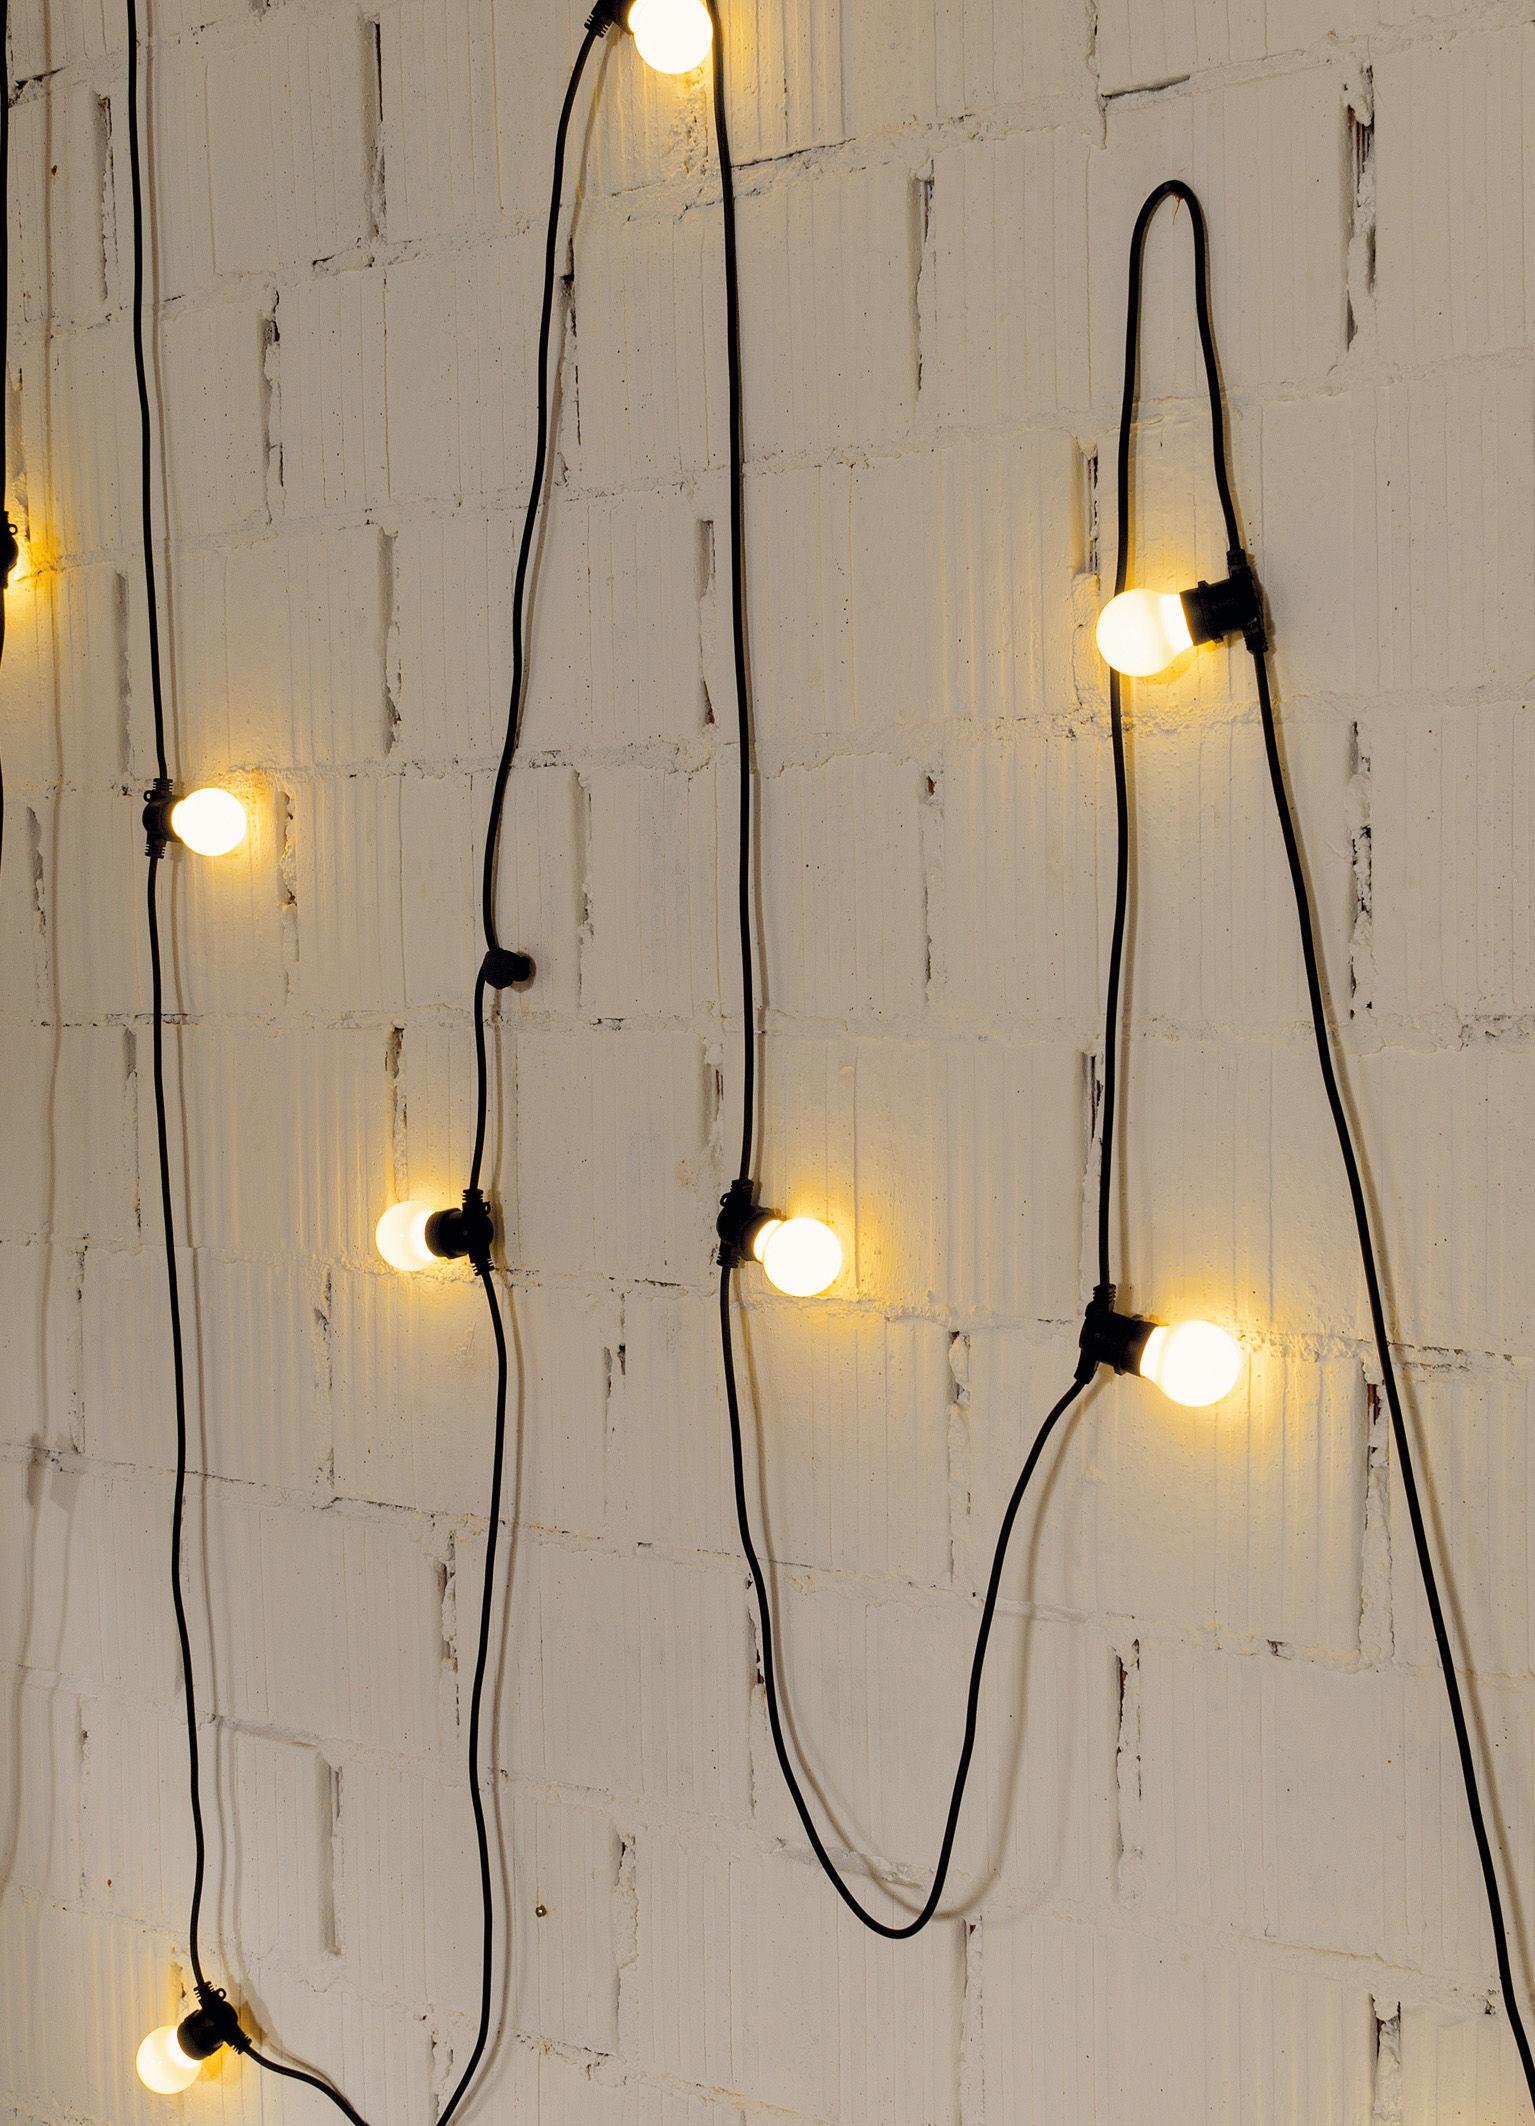 guirlande lumineuse bella vista clear seletti c ble noir ampoules transparentes l 142. Black Bedroom Furniture Sets. Home Design Ideas